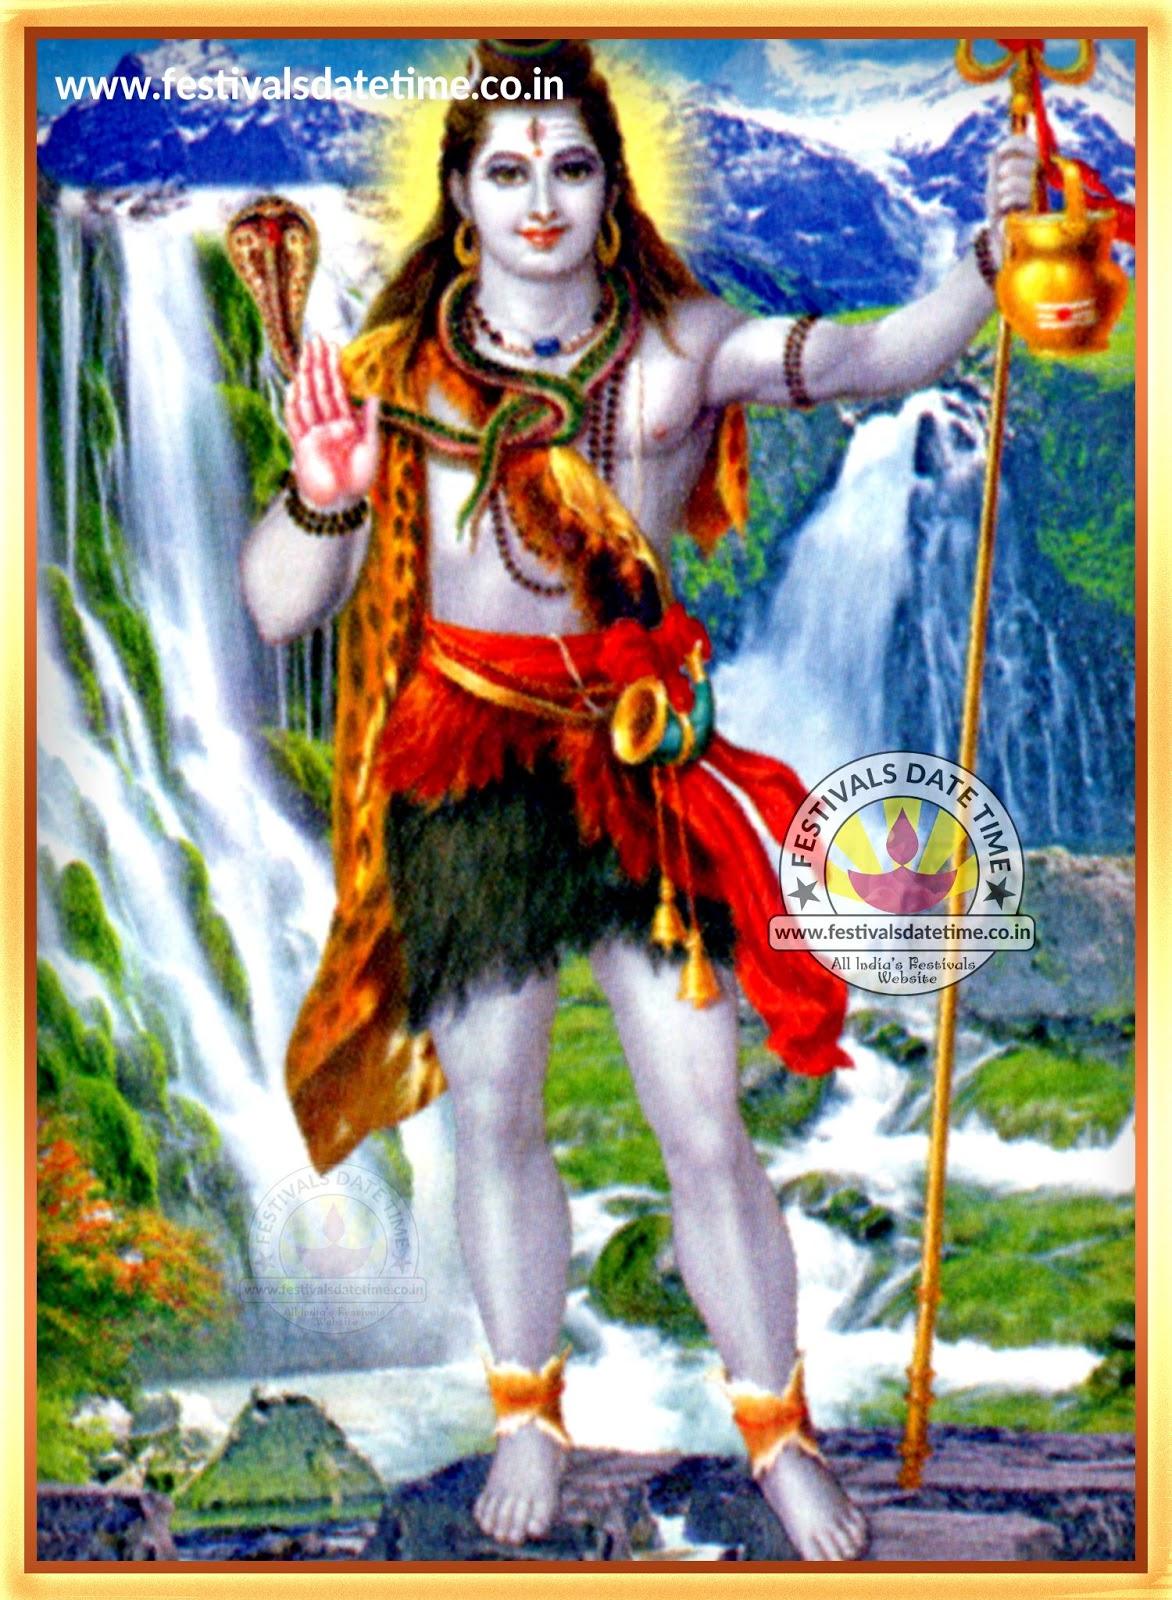 Lord Shiva Wallpaper Free Download भगव न श व क फ ट ड उनल ड क ज य Festivals Date Time